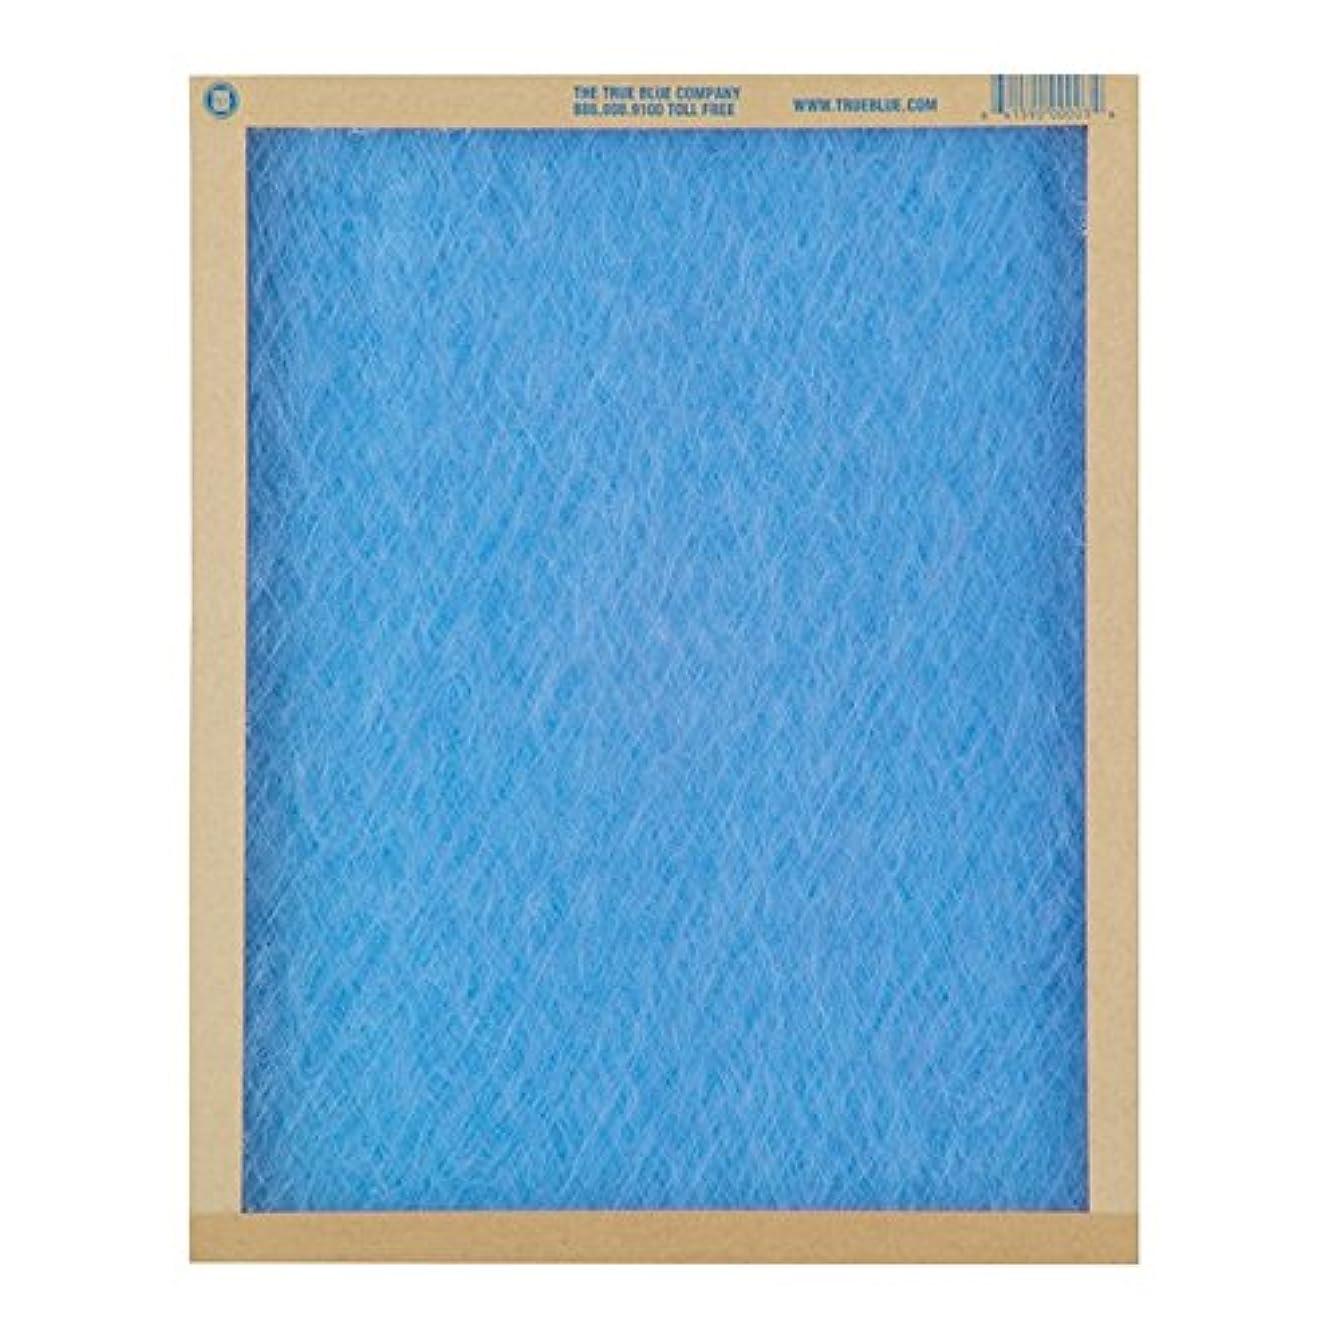 True Blue 116251 16